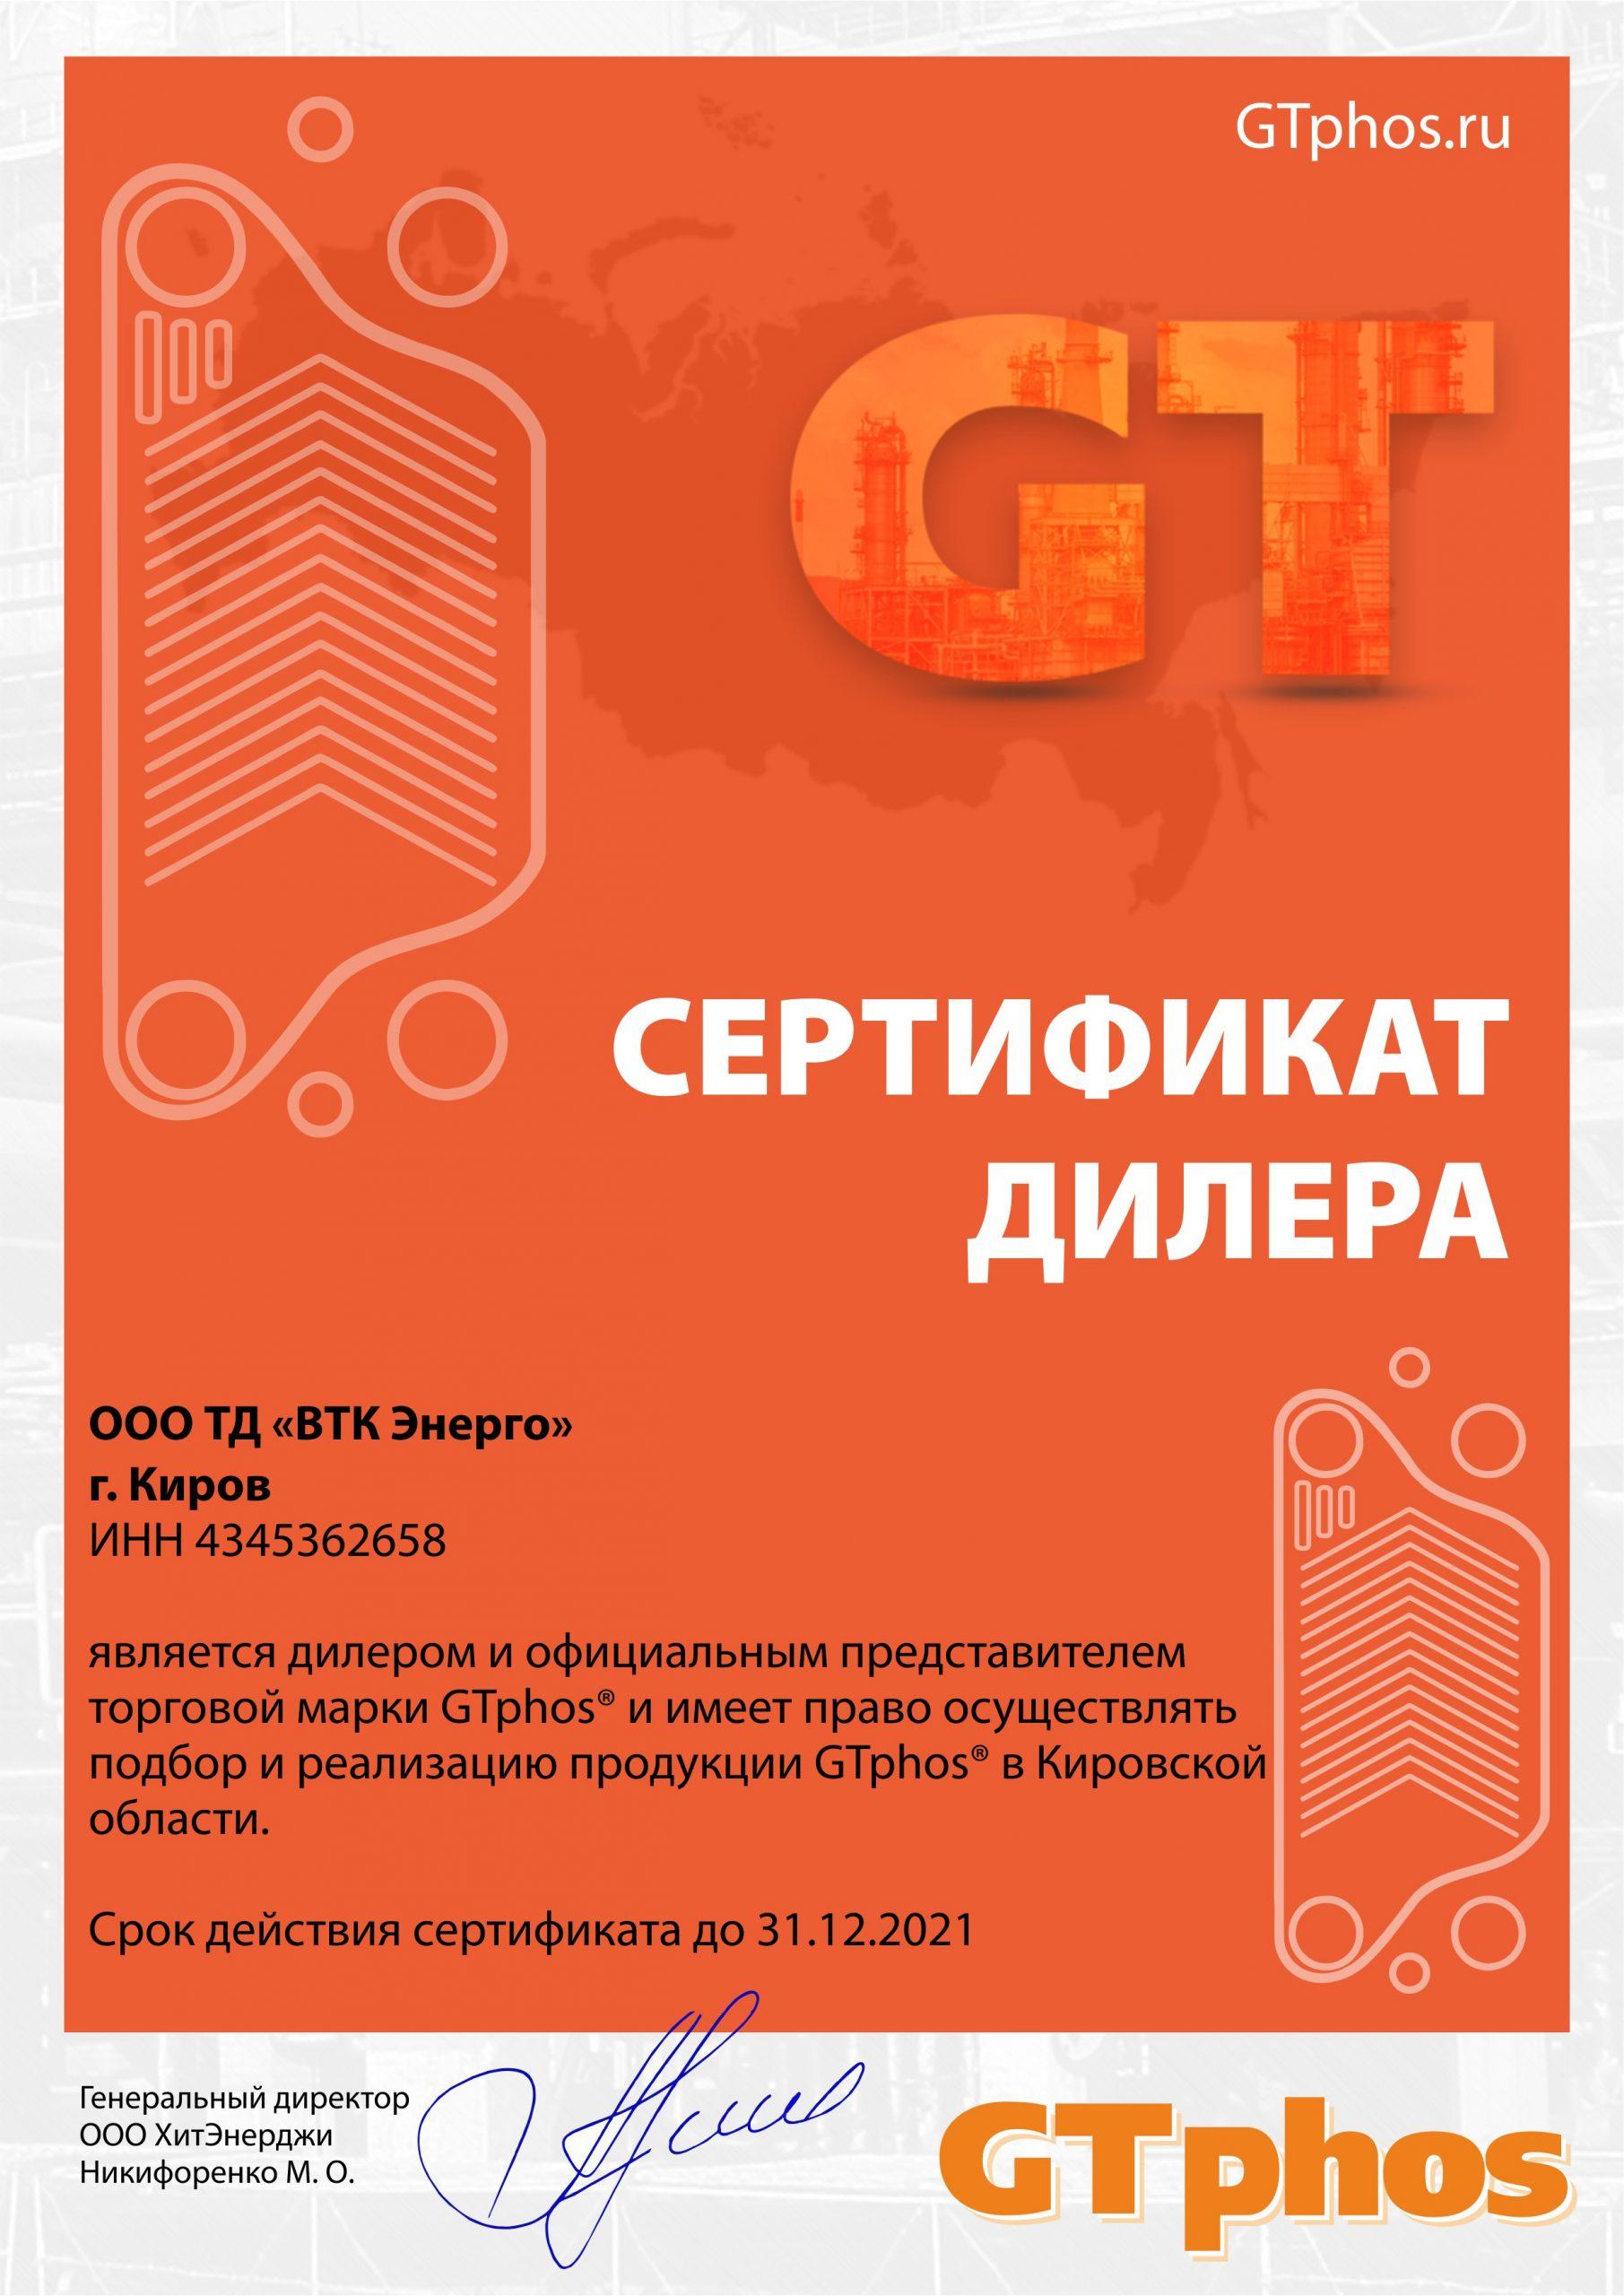 сертификат дилера GTphos